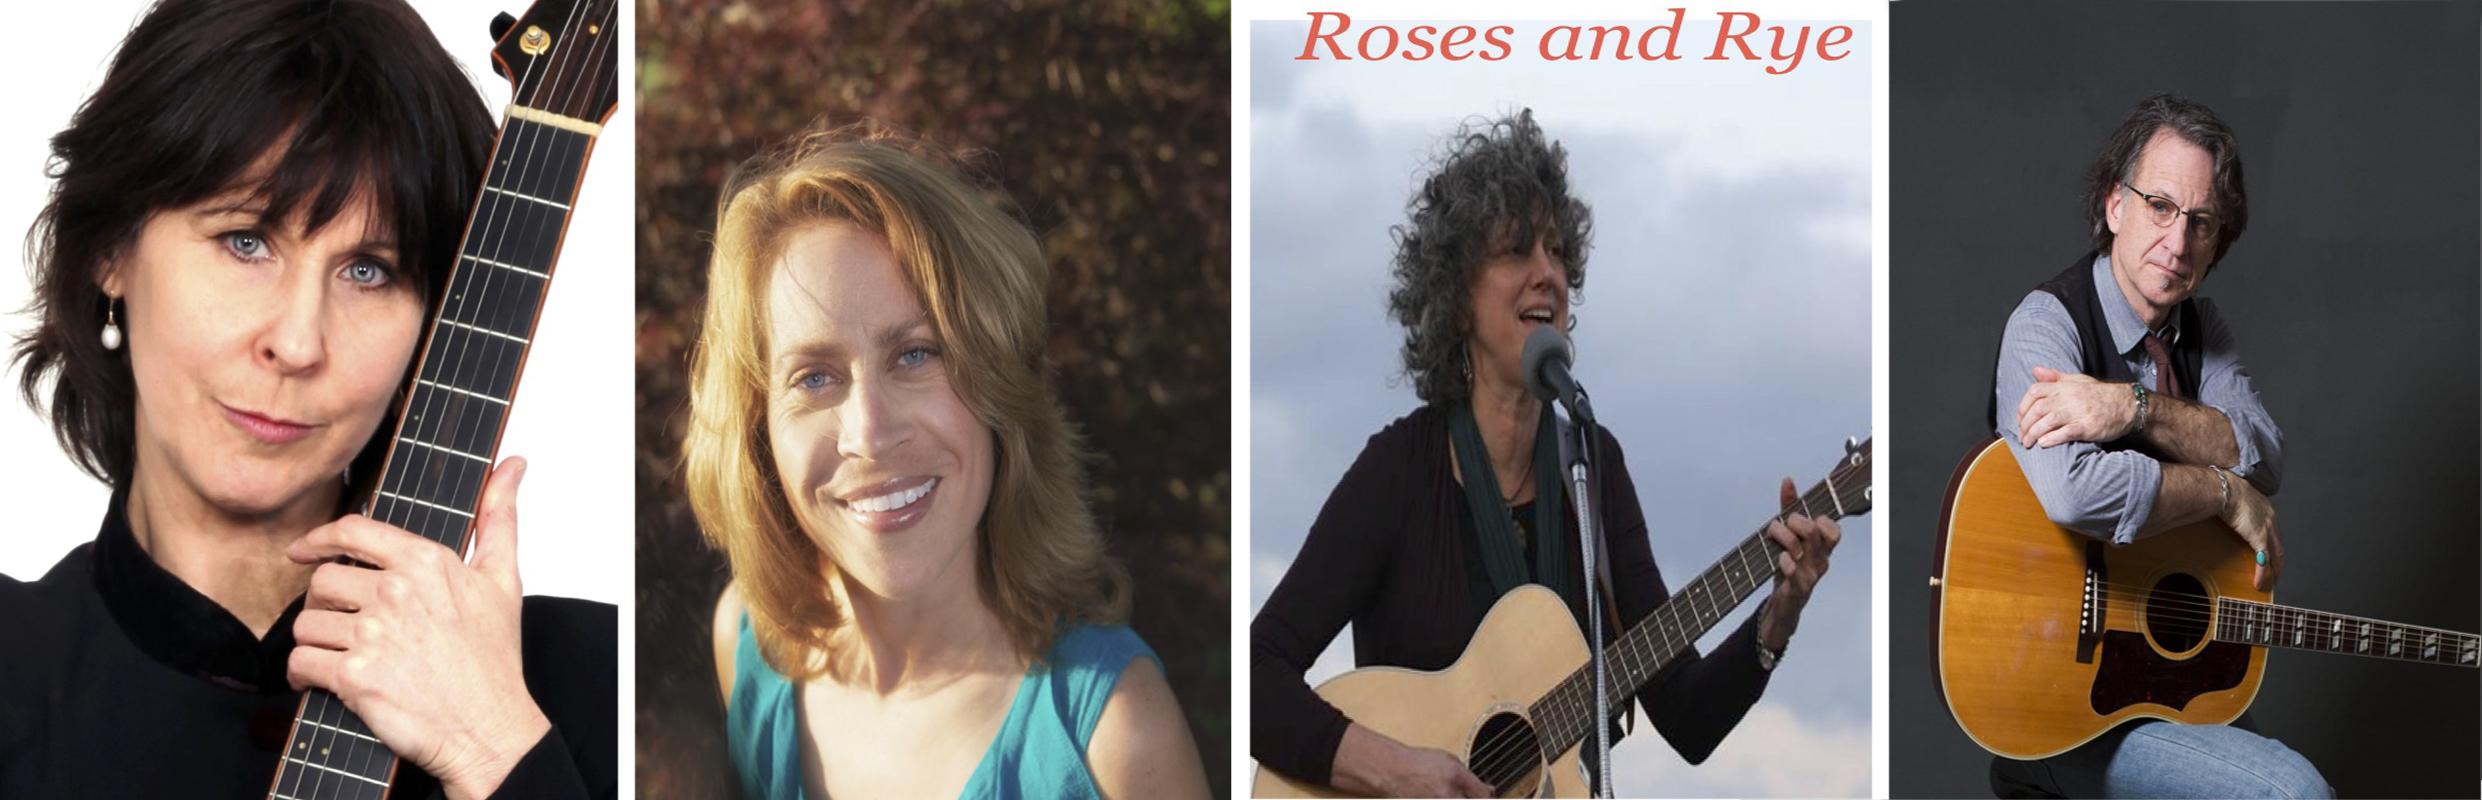 Roses & Rye artists